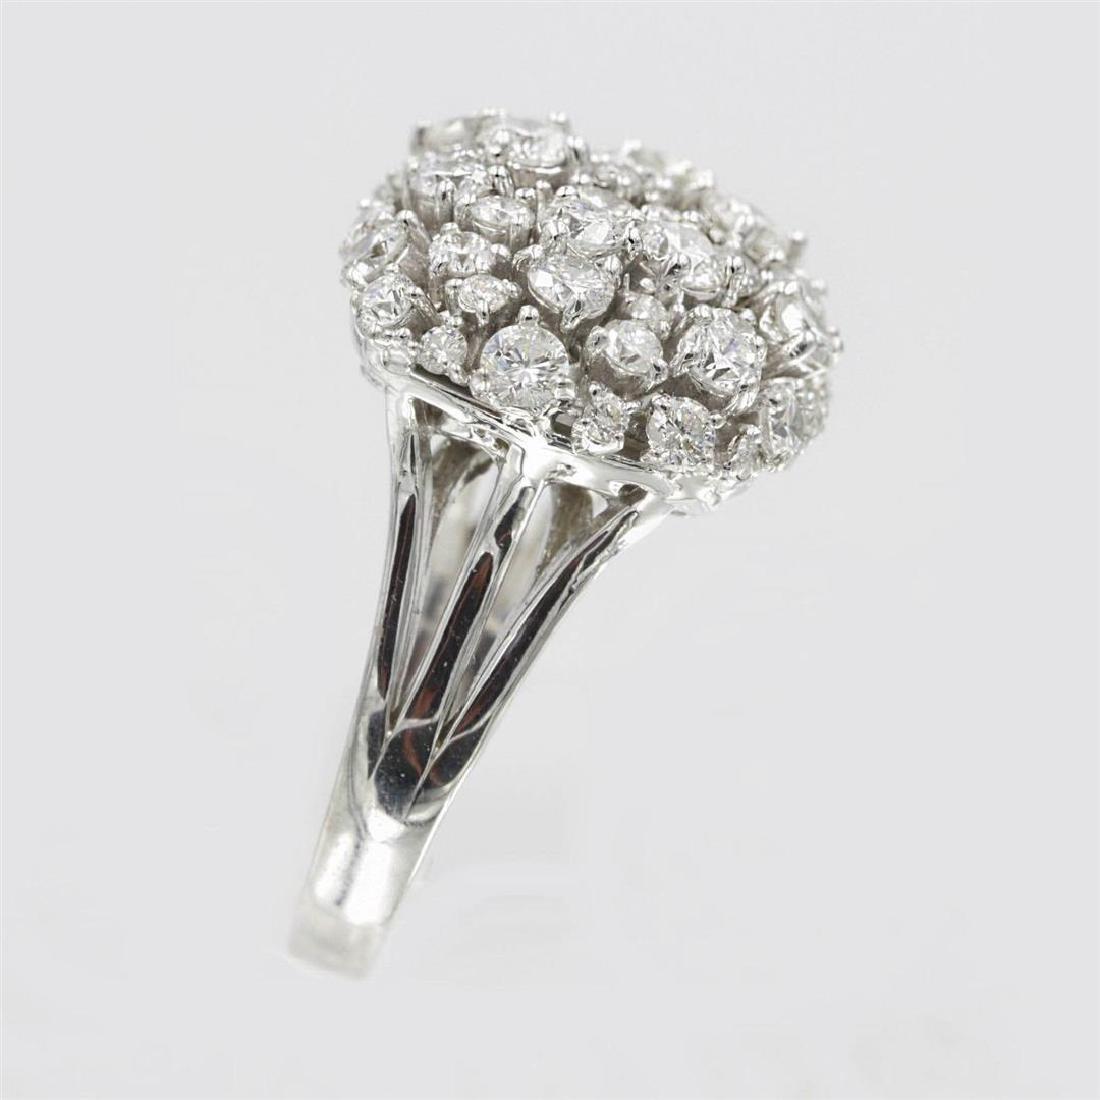 2.33 ctw Diamond Anniversary Ring - 14KT White Gold - 3